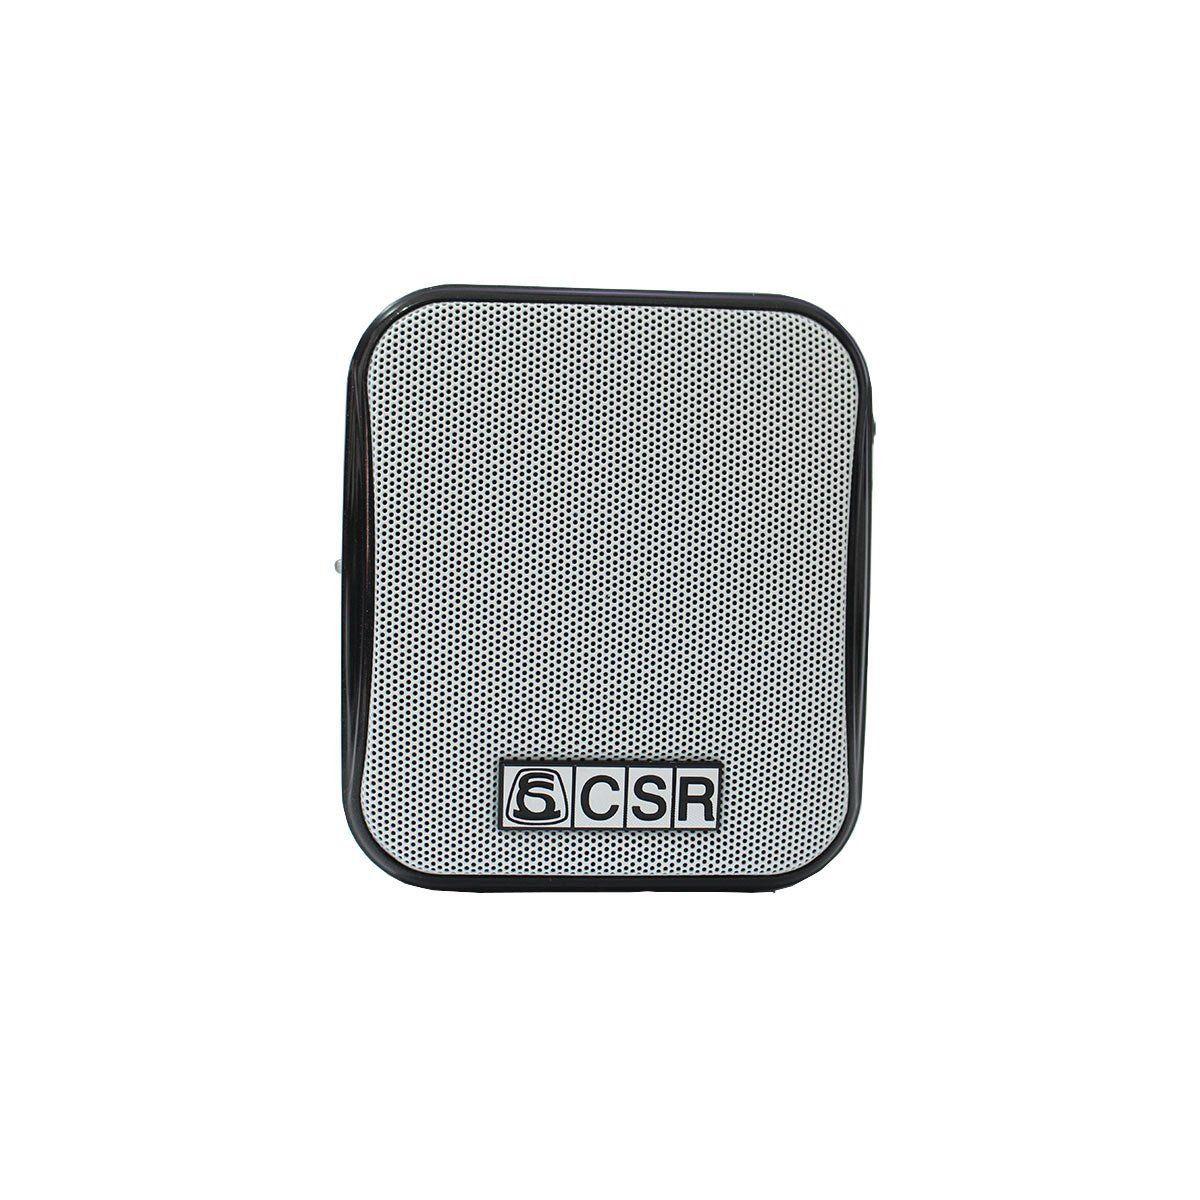 KIT PROFESSOR PORTÁTIL C/ FIO AMPLIFICADO USB / BLUETOOTH / BATERIA - BW 178BT CSR